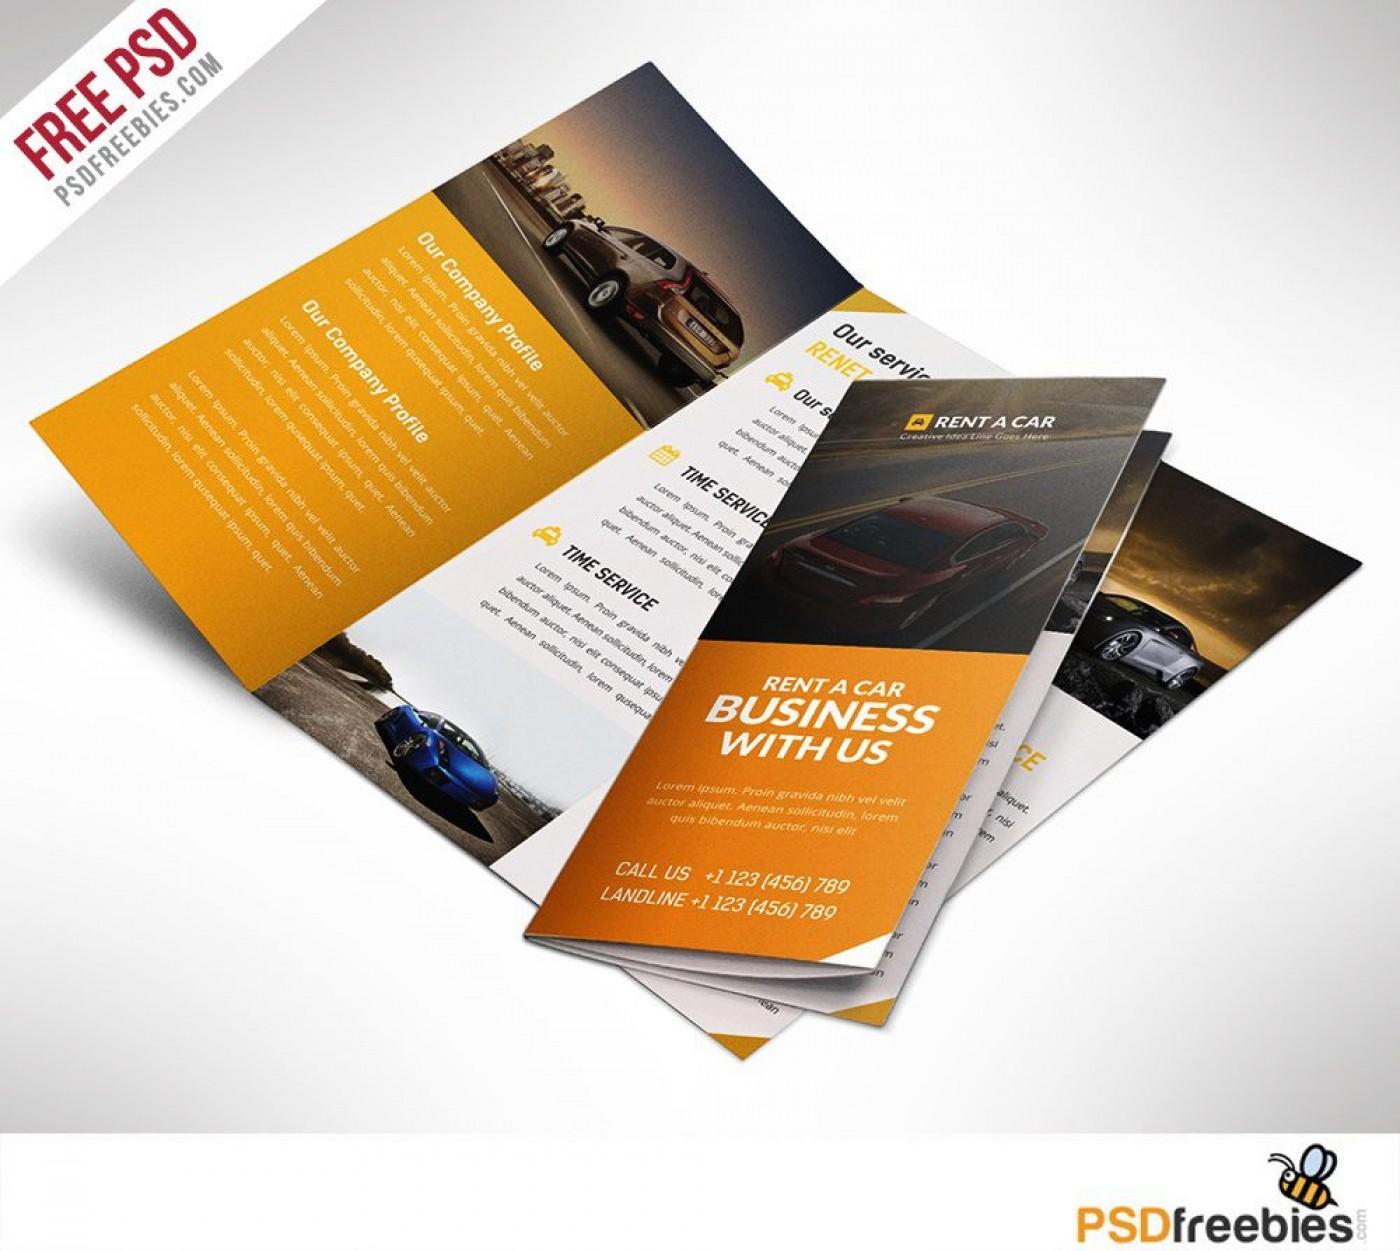 003 Wonderful Corporate Brochure Design Template Psd Free Download High Resolution  Hotel1400